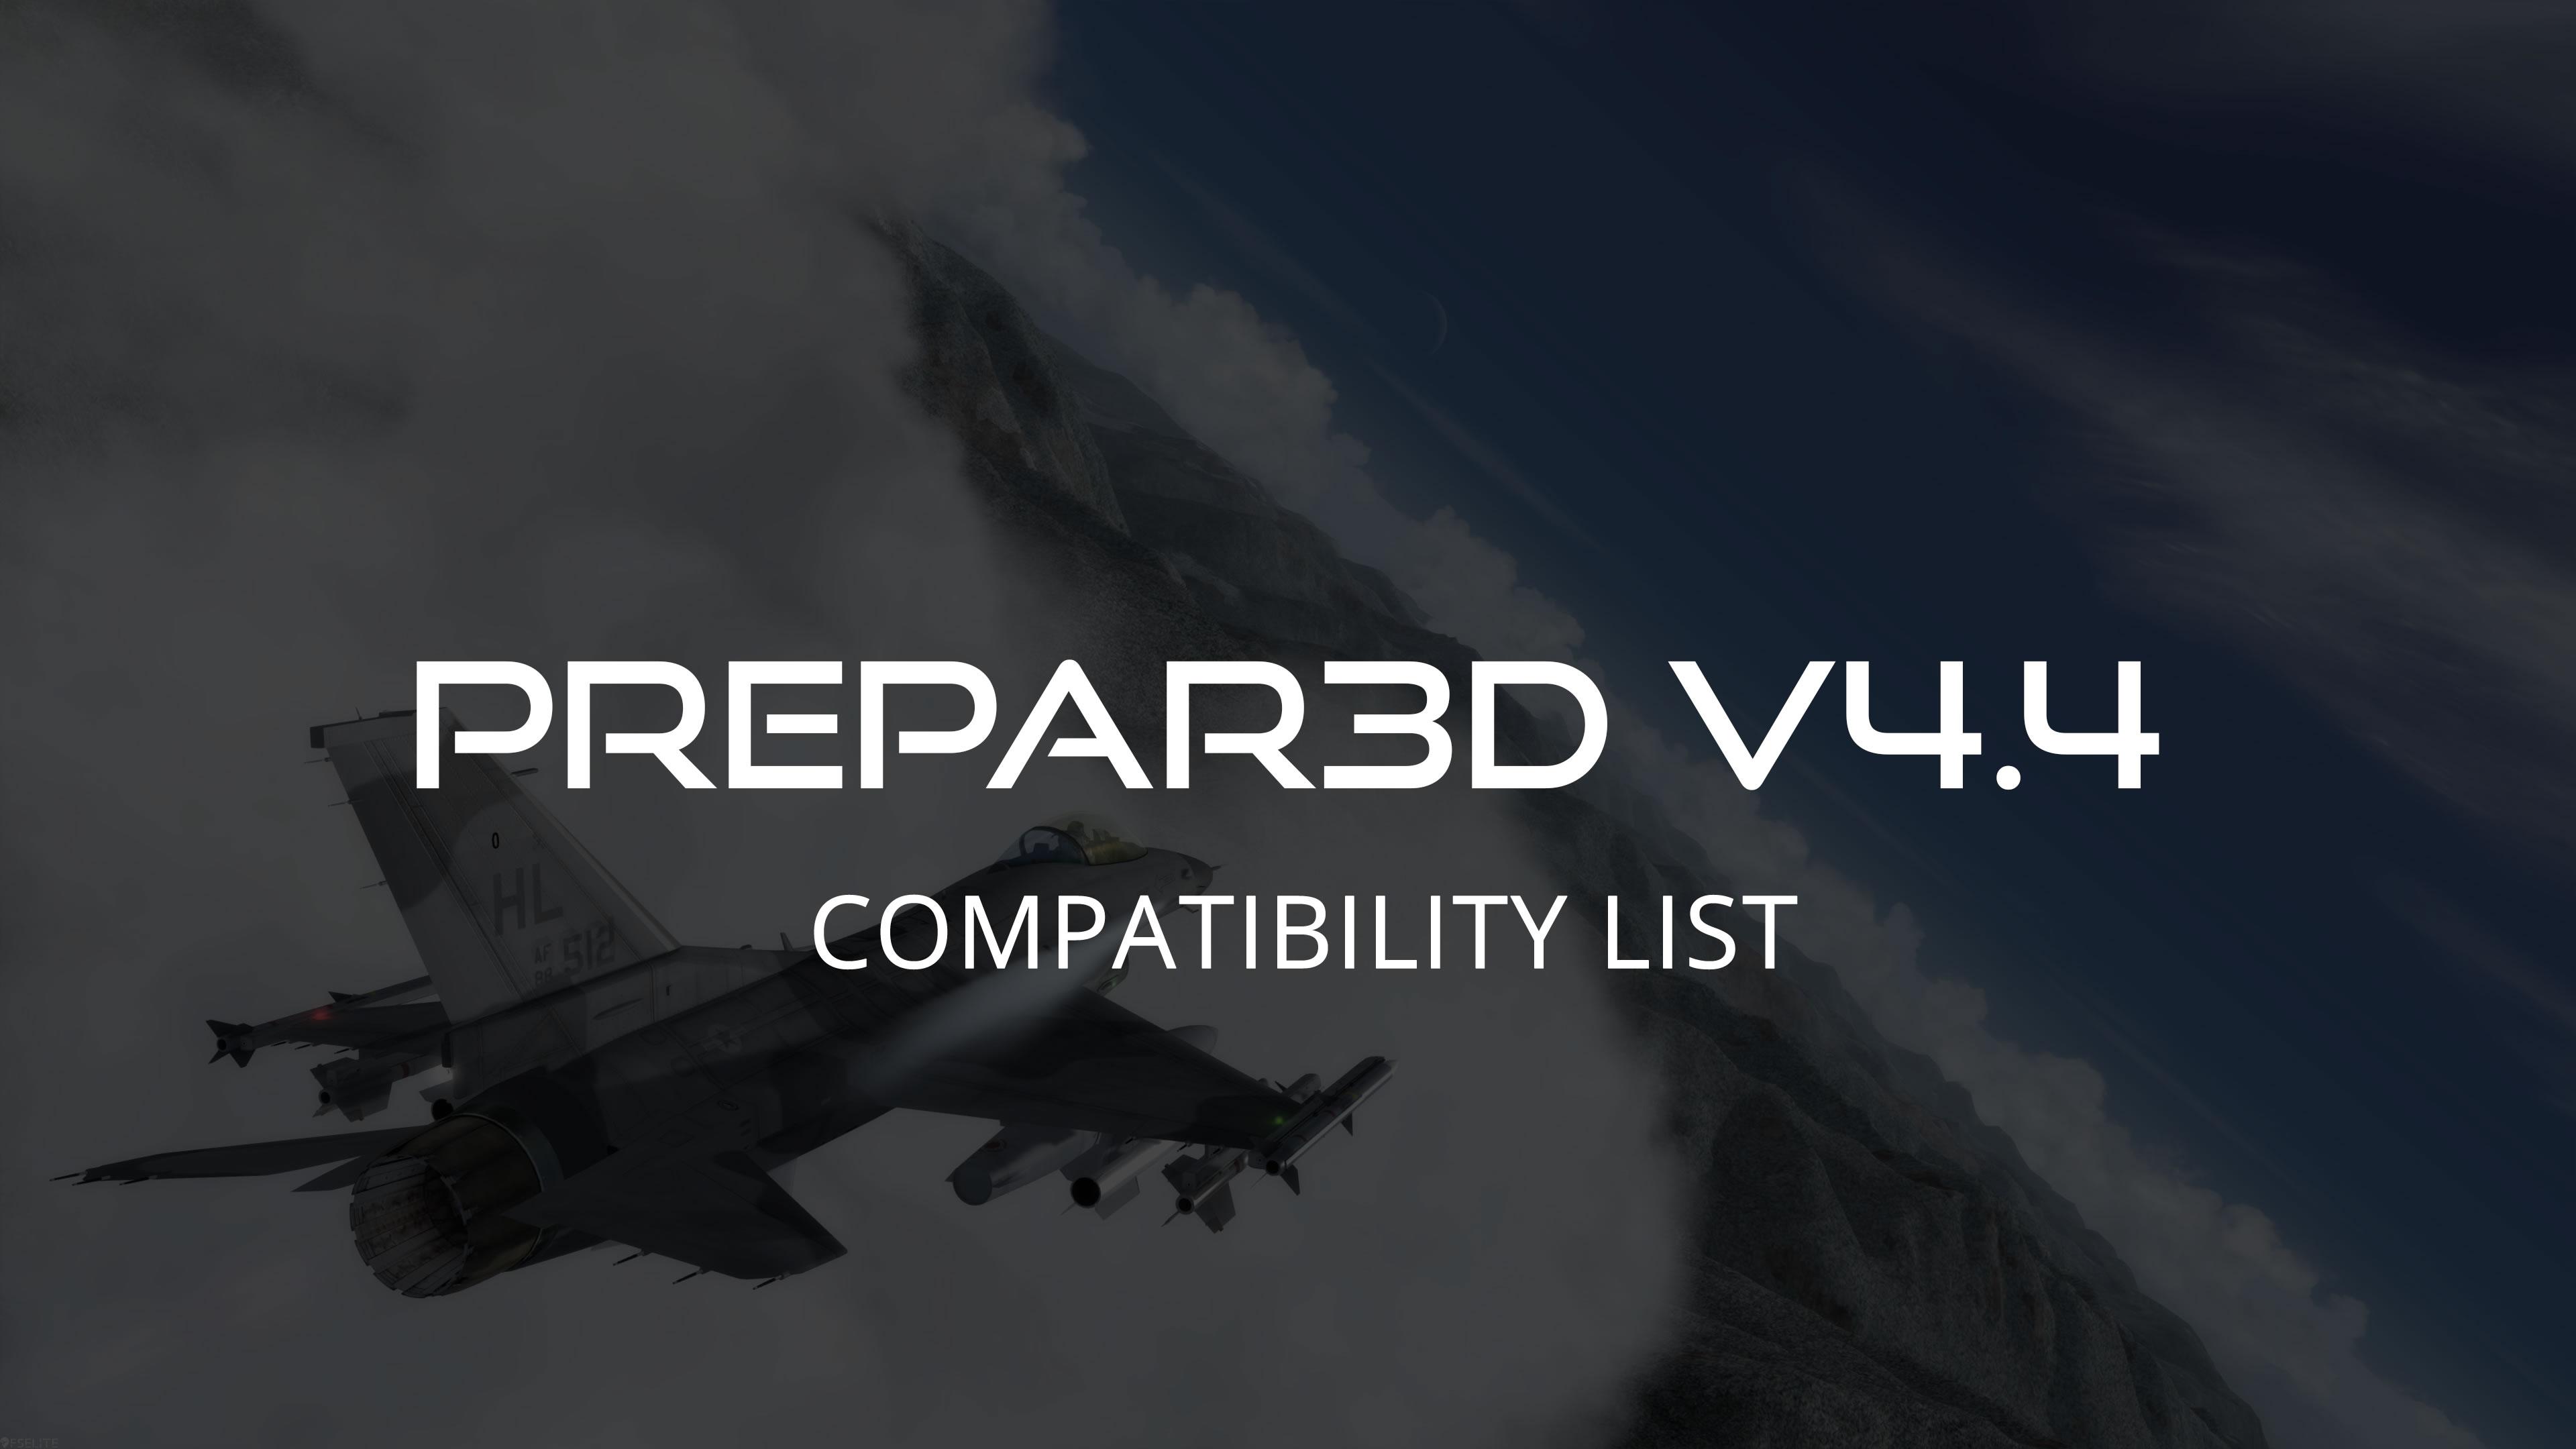 UPDATED 04DEC18: Prepar3D V4 4 Add-on Compatibility Update List